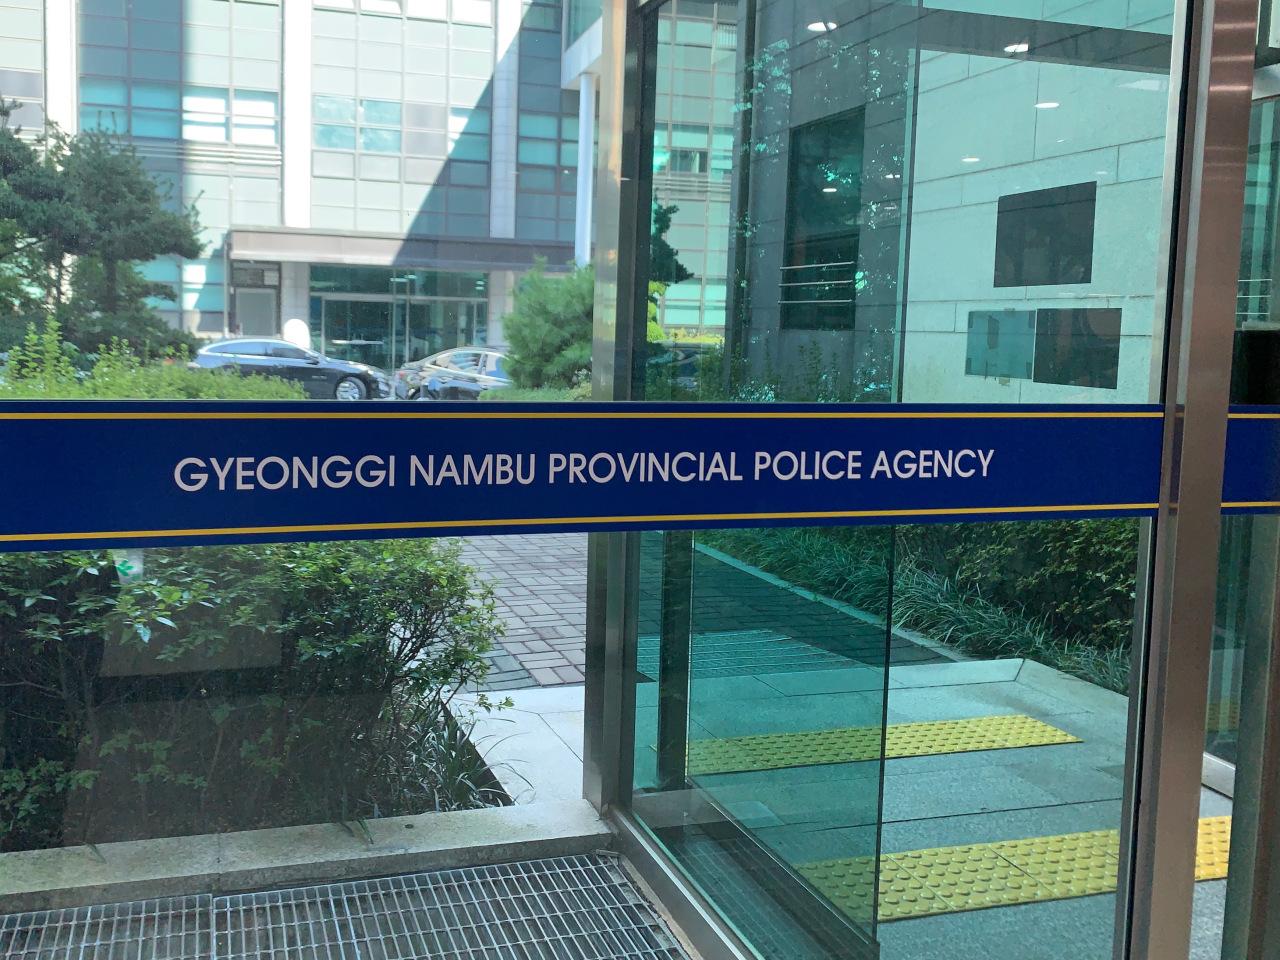 Gyeonggi Nambu Provincial Police Agency (Kim Arin/The Korea Herald)